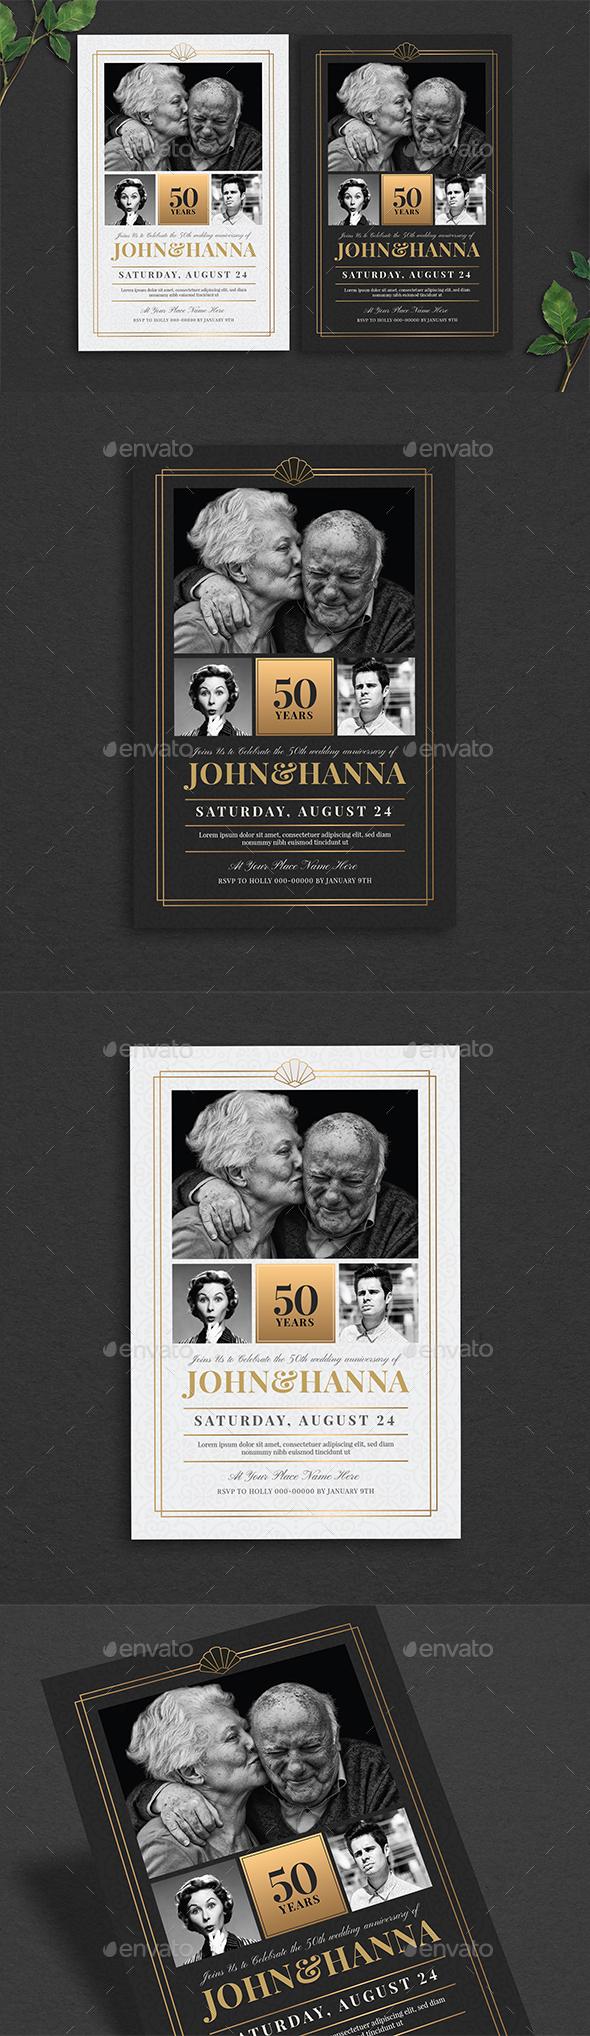 Wedding Anniversary Invitation - Cards & Invites Print Templates